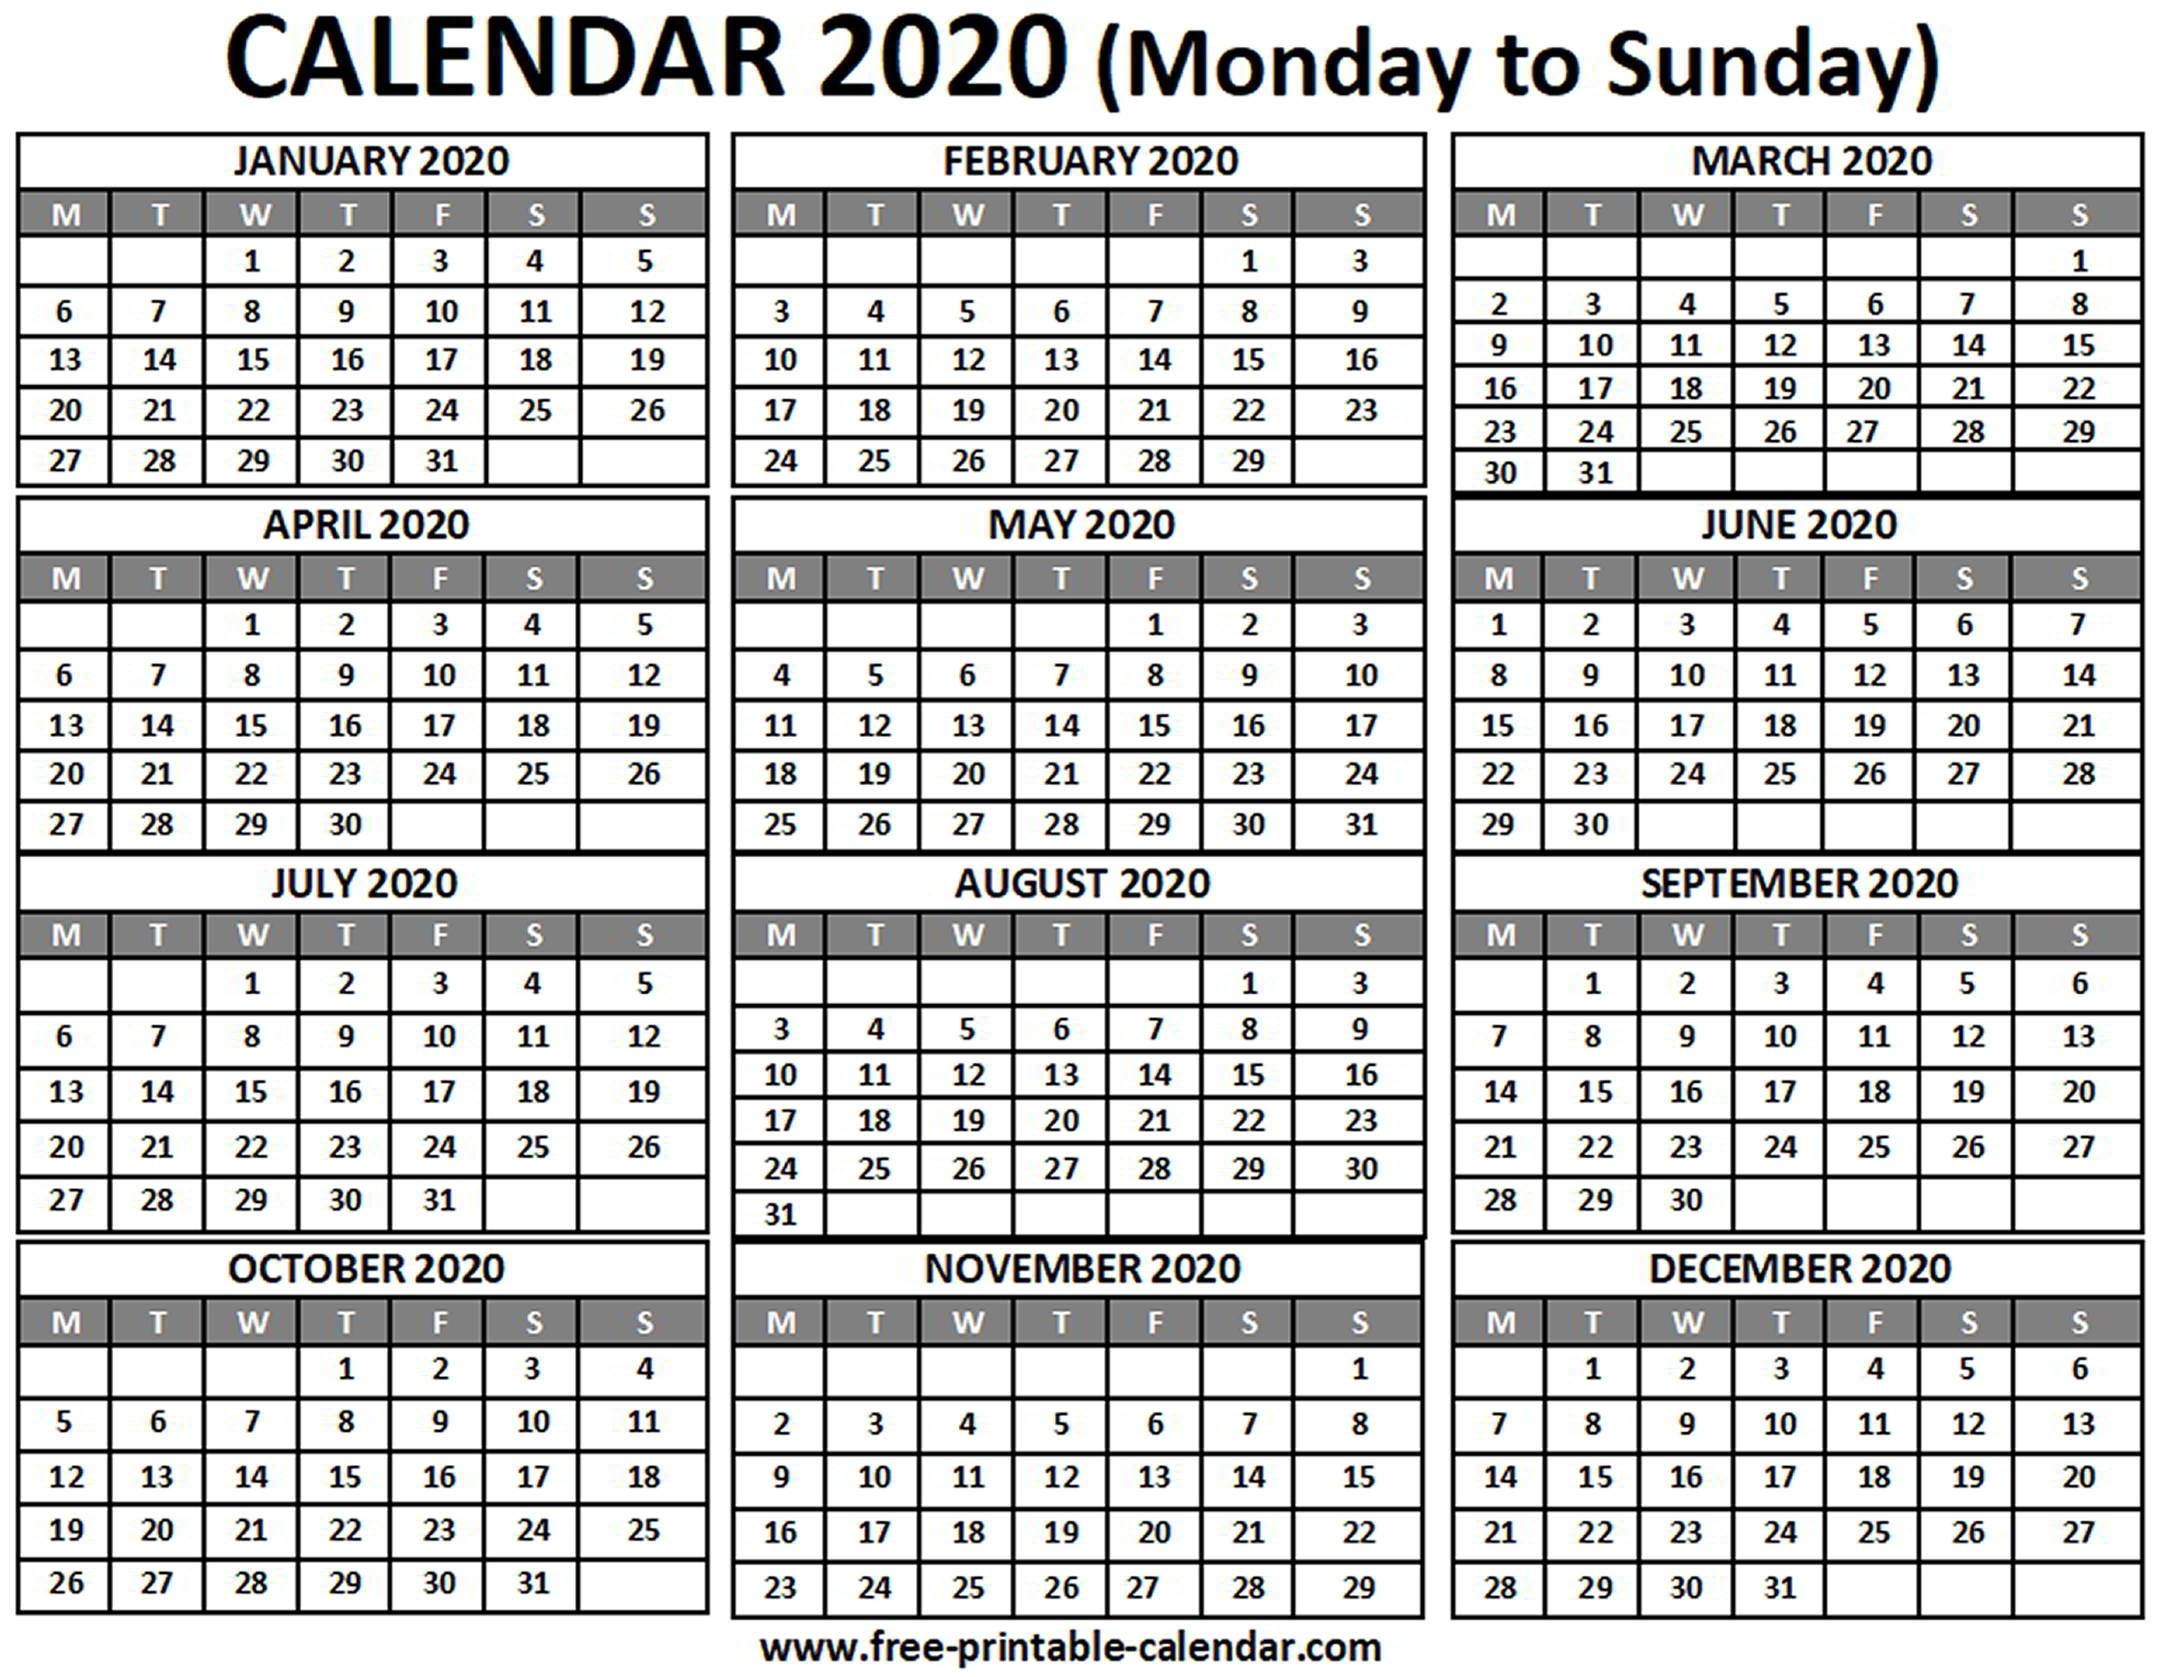 2020 Calendar - Free-Printable-Calendar regarding Free 2020 Calendar Monday Start